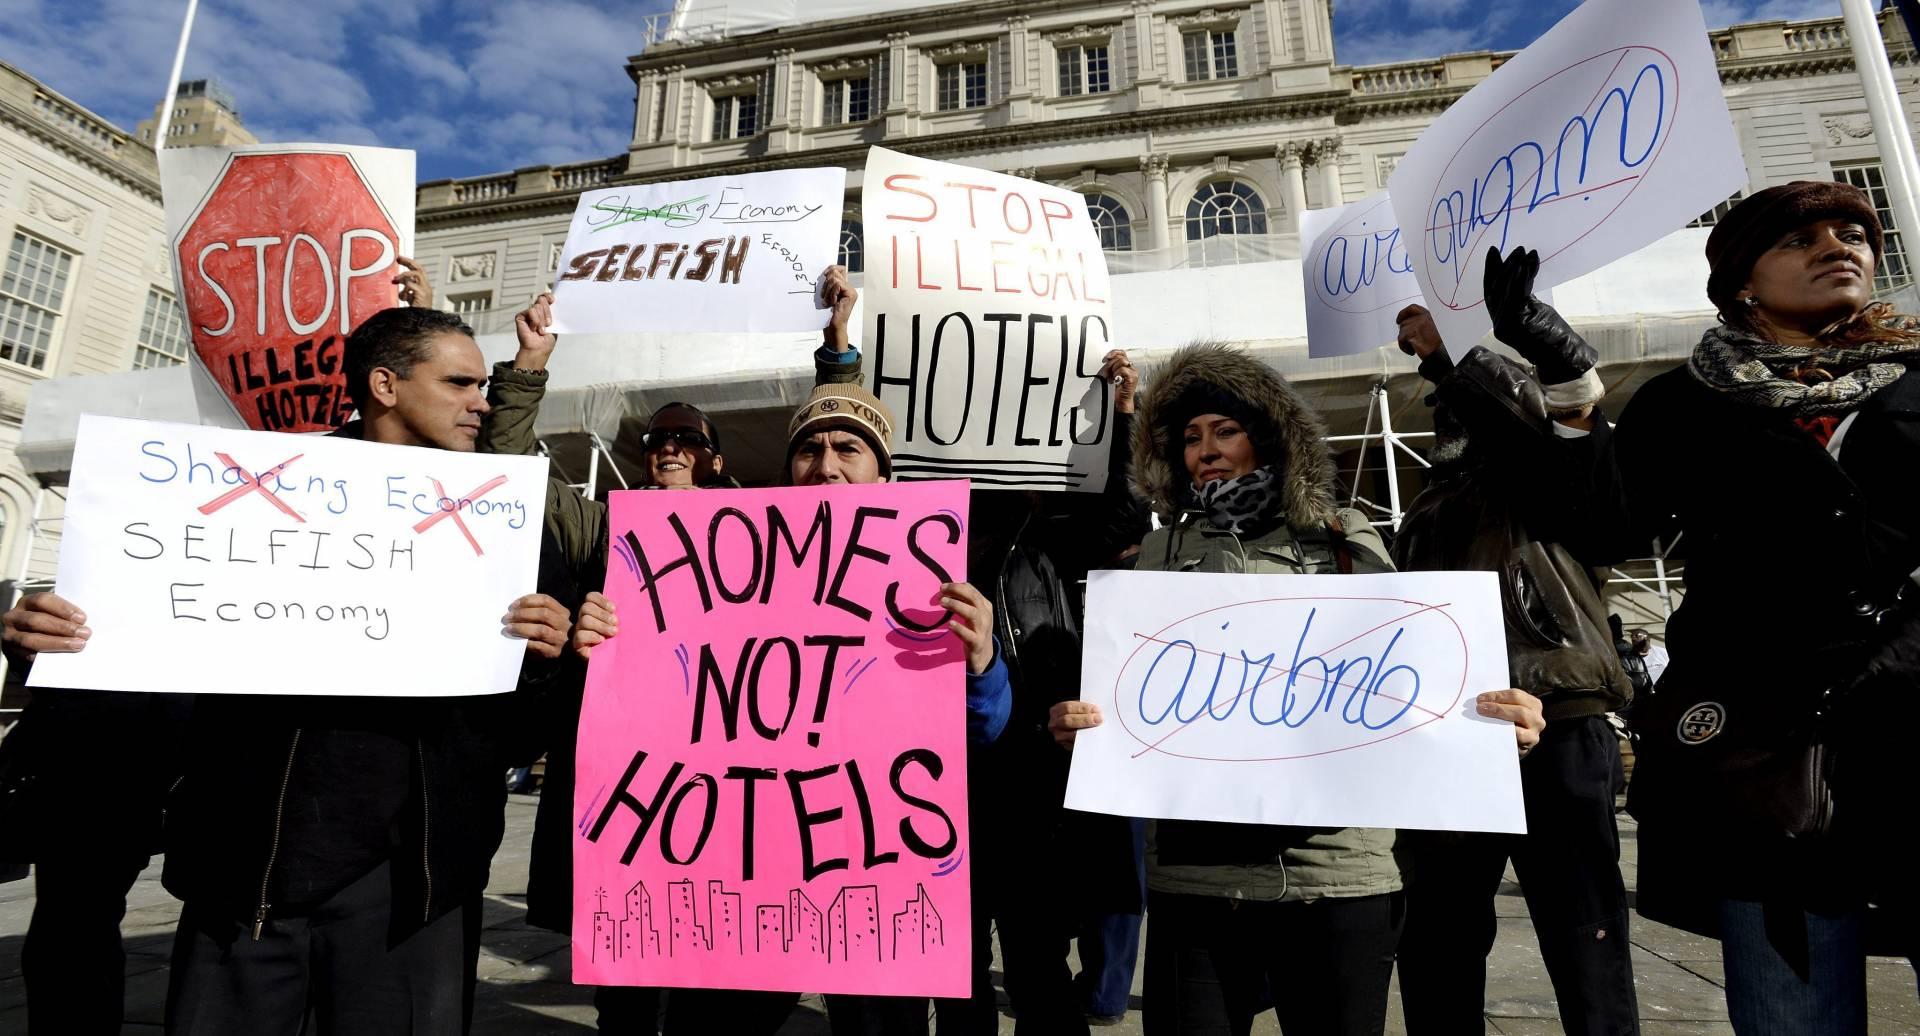 Manifestantes protestan contra Airbnb.